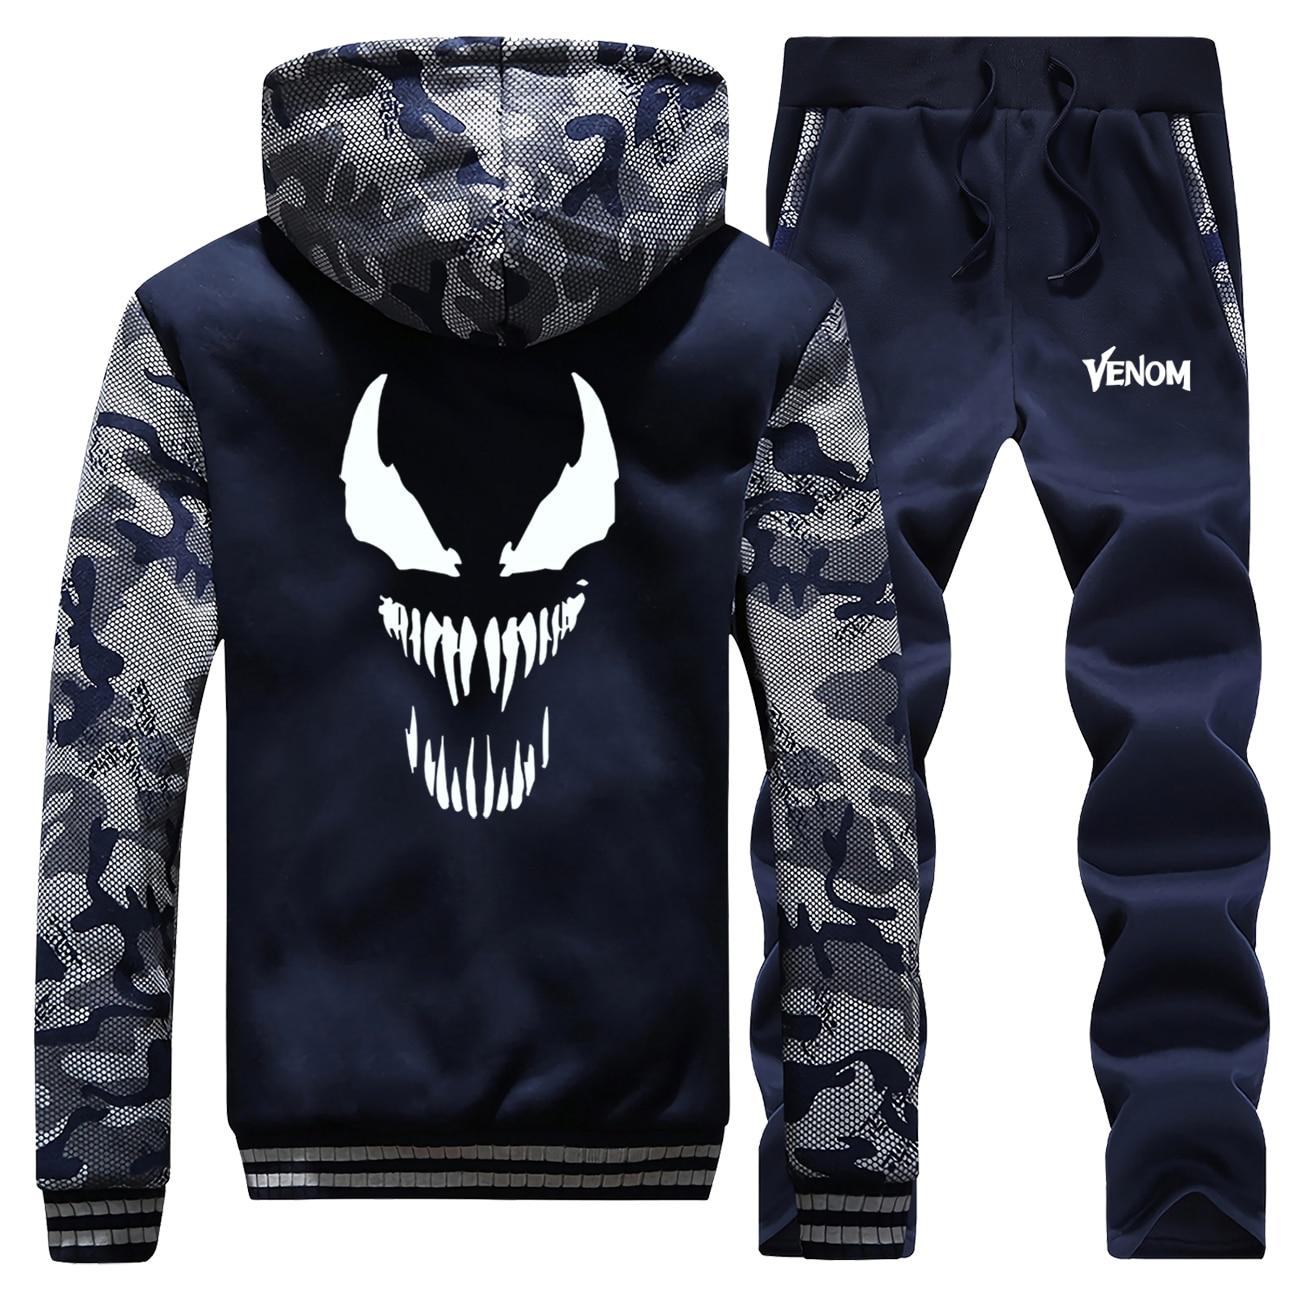 Marvel Sweatshirt Men Venom Marvel Superhero Anime Camo Hoodie Pants 2pcs Sets Men Funny Fleece Sportswear Harajuku Streetwear